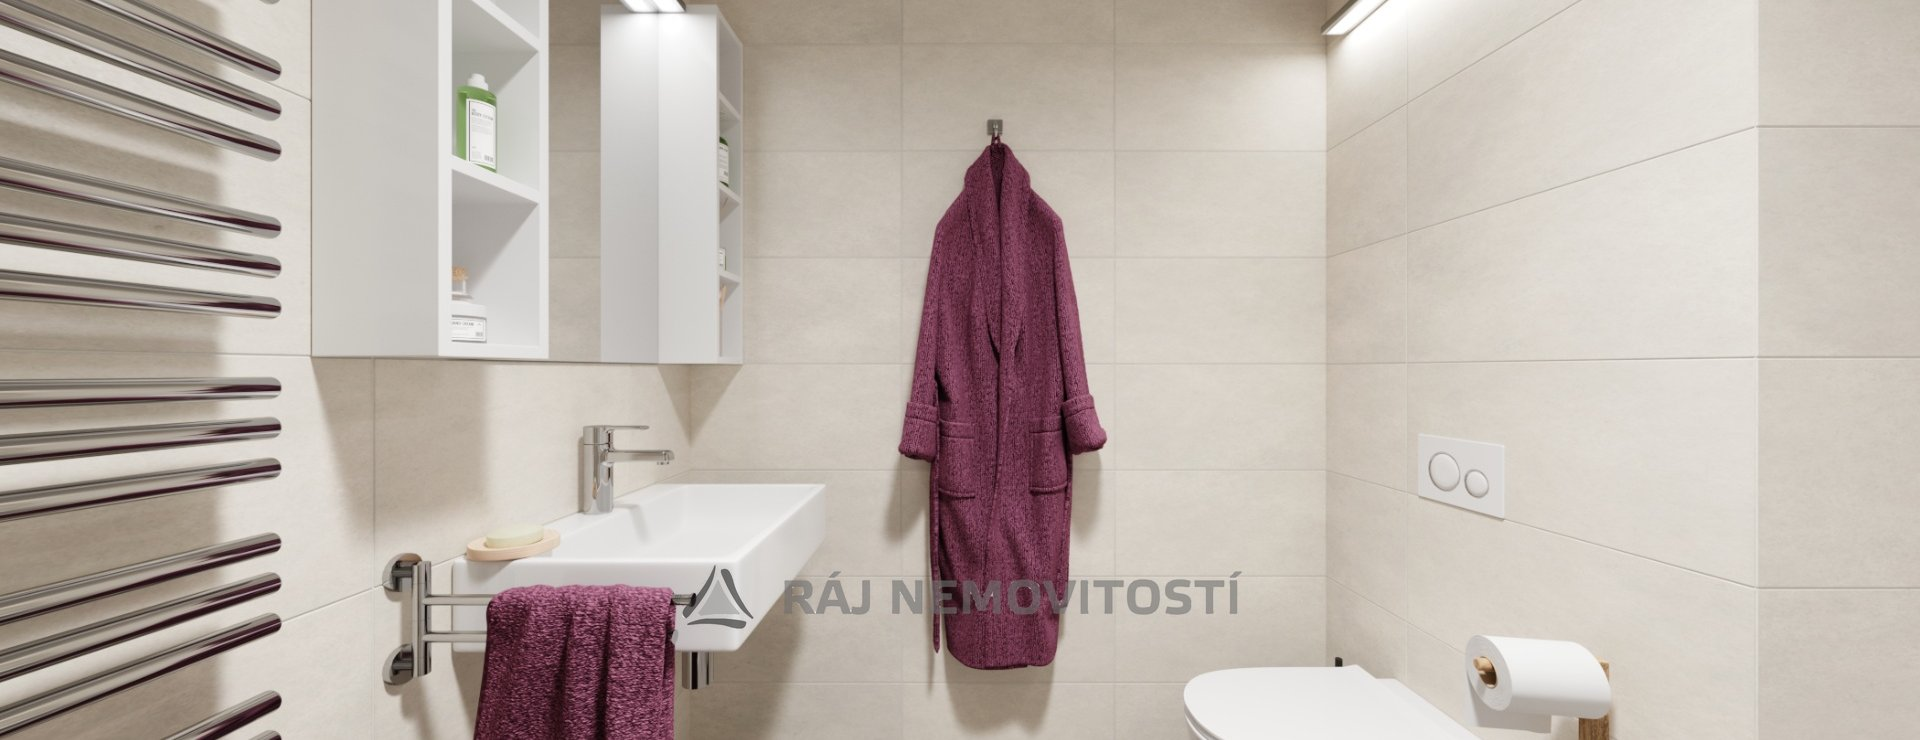 3_03_koupelna sprcha_1